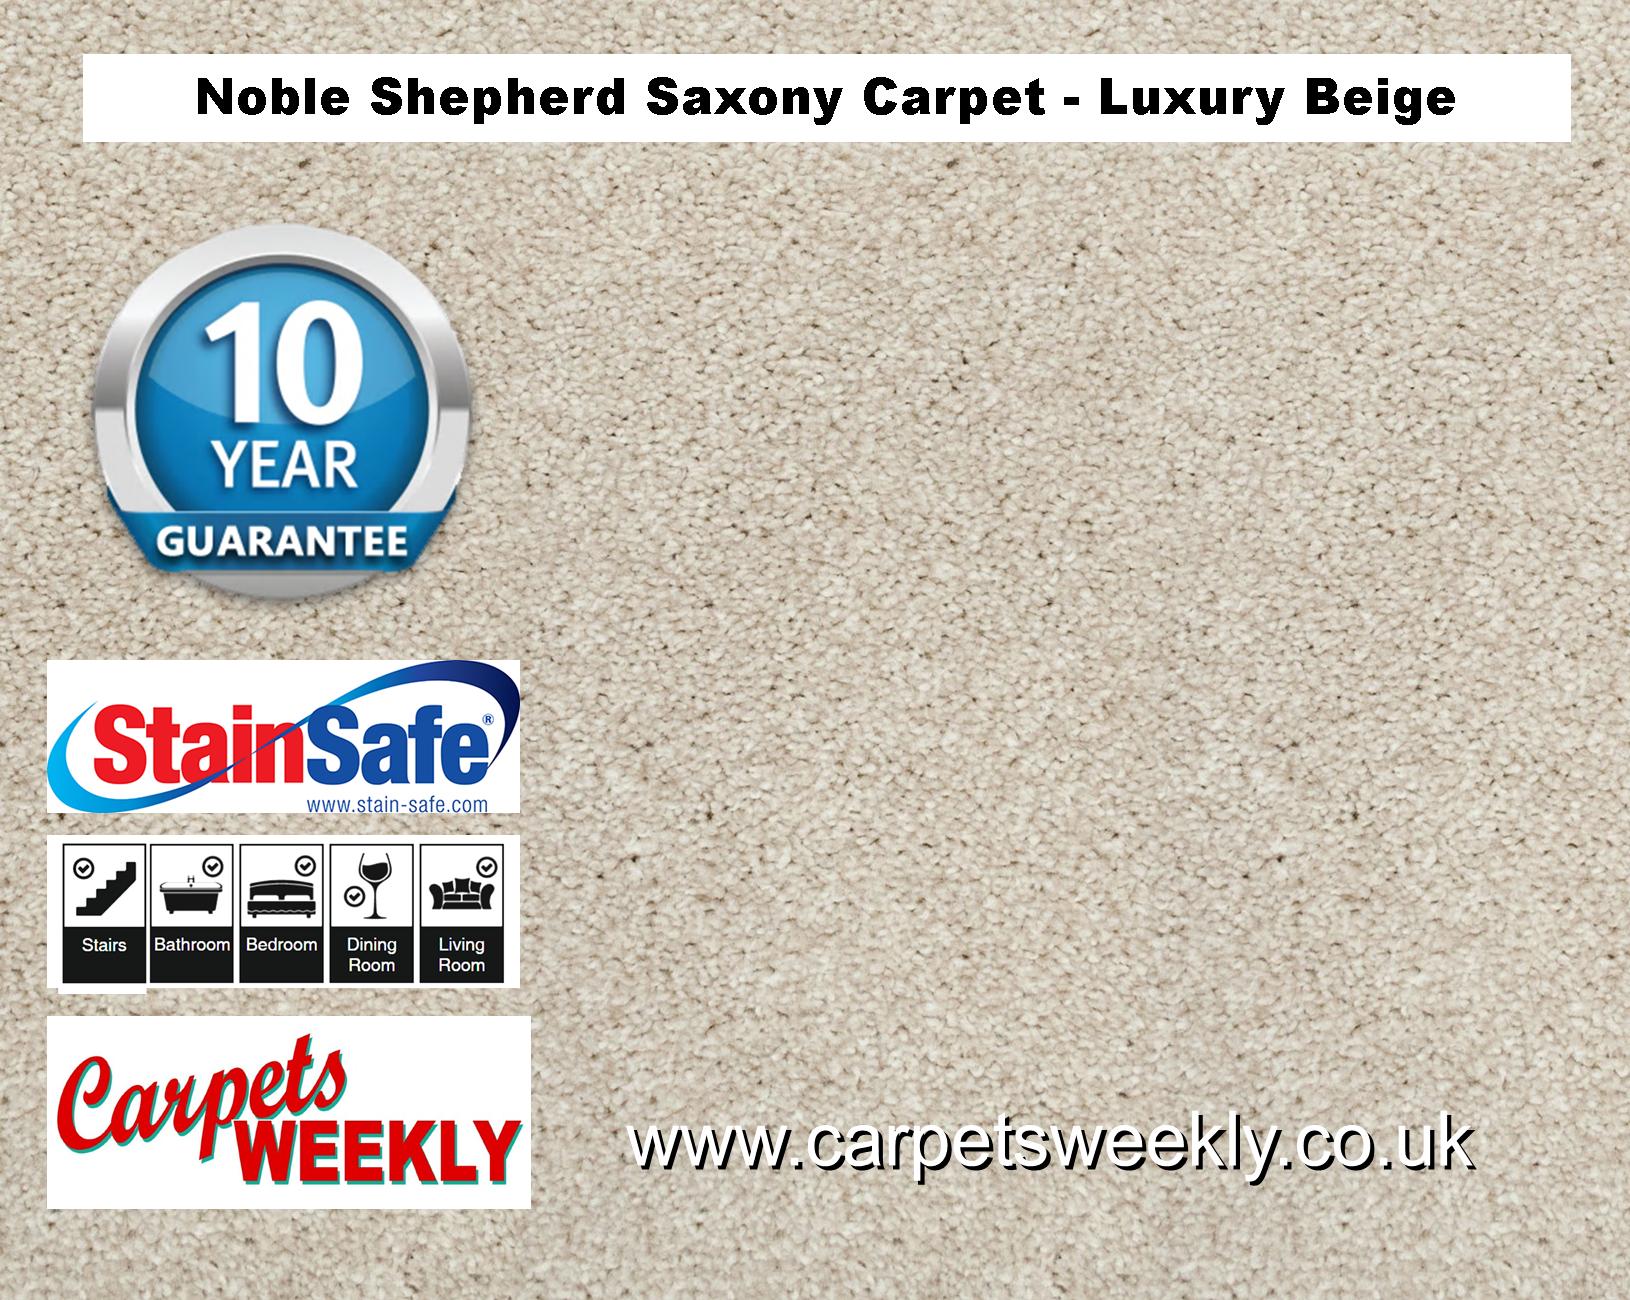 Noble Shepherd Saxony Carpet from Carpets Weekly Luxury Beige (680)